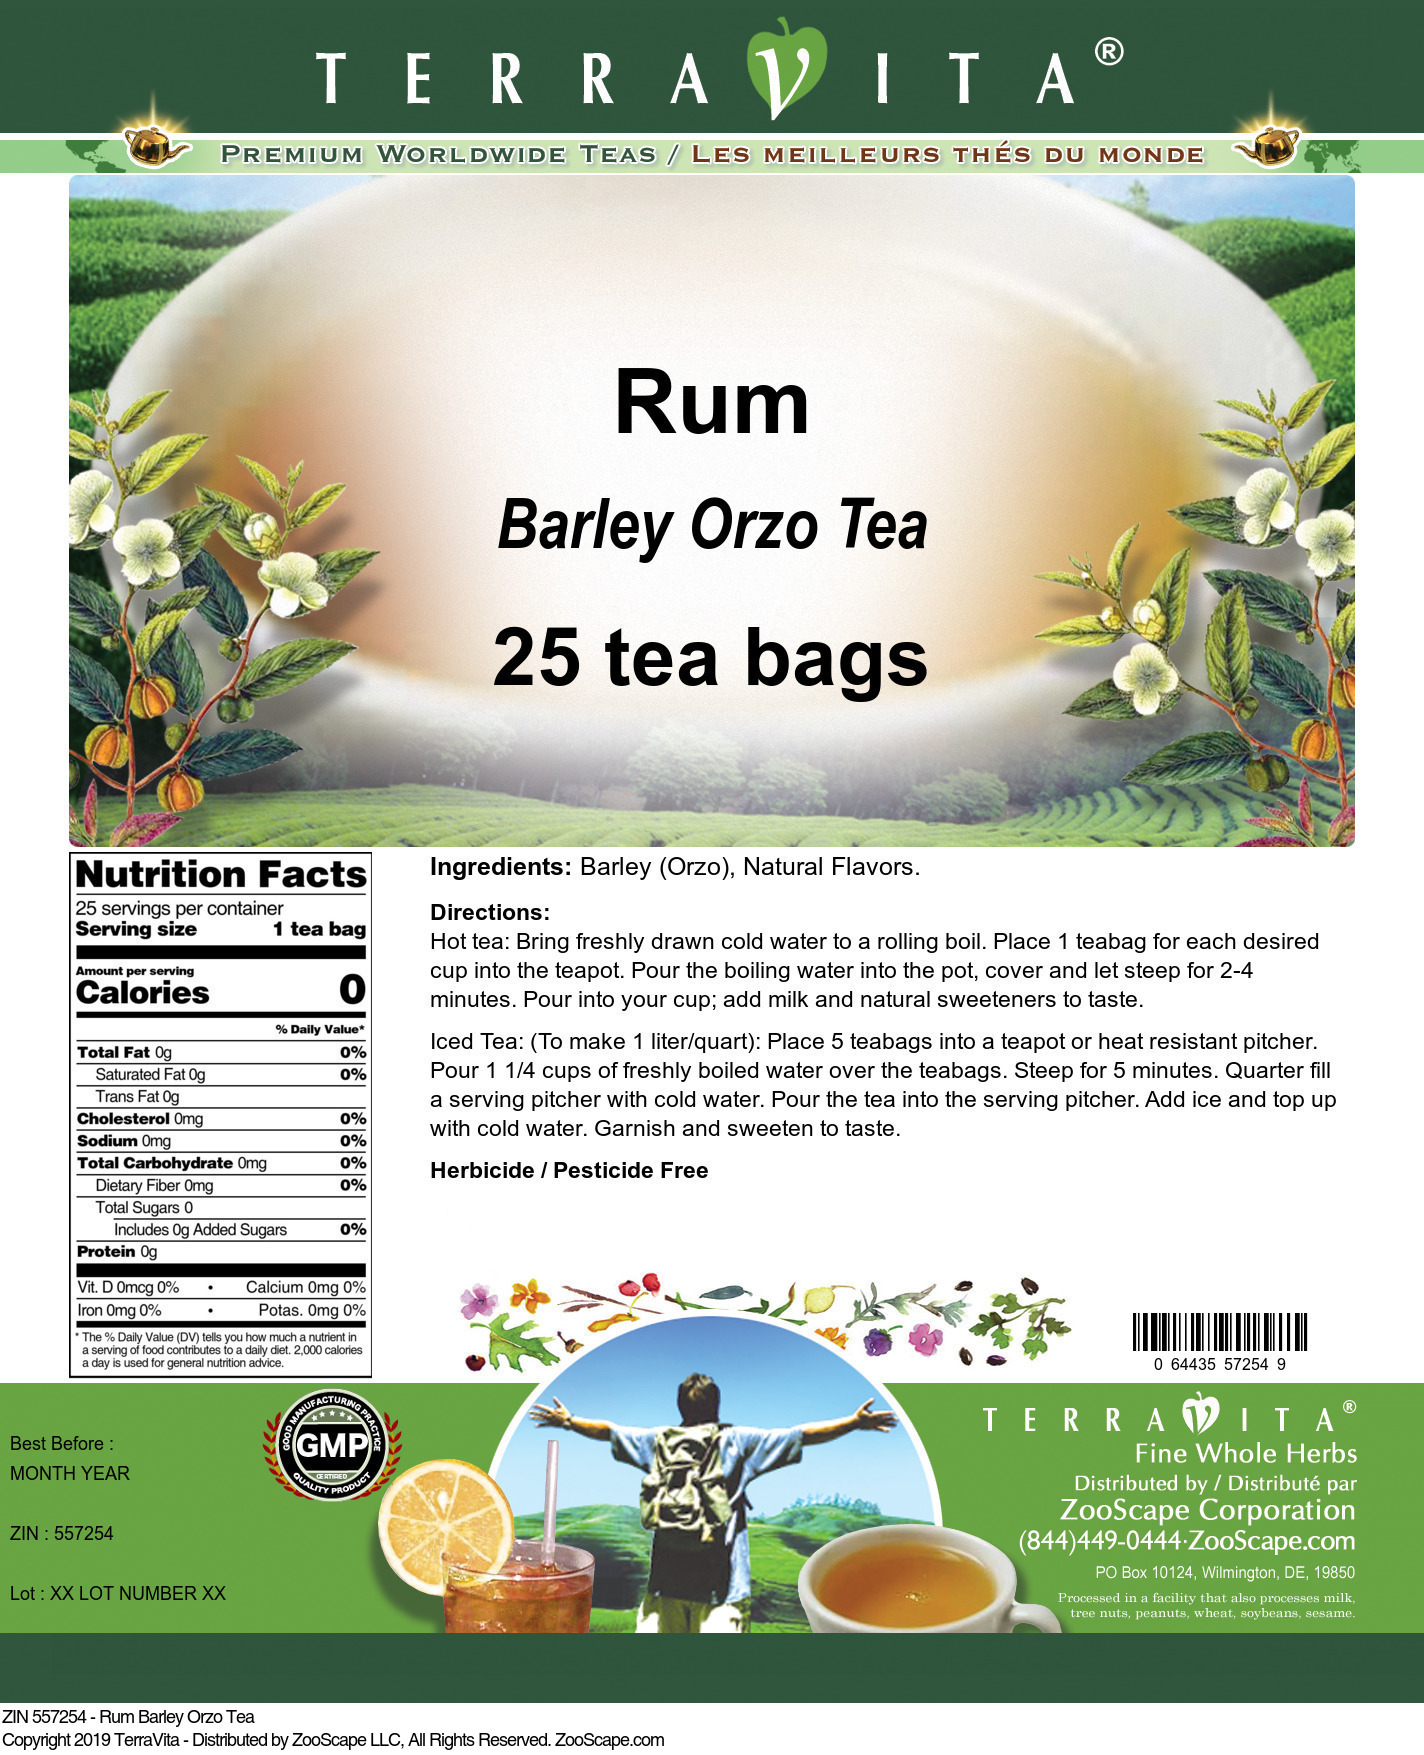 Rum Barley Orzo Tea